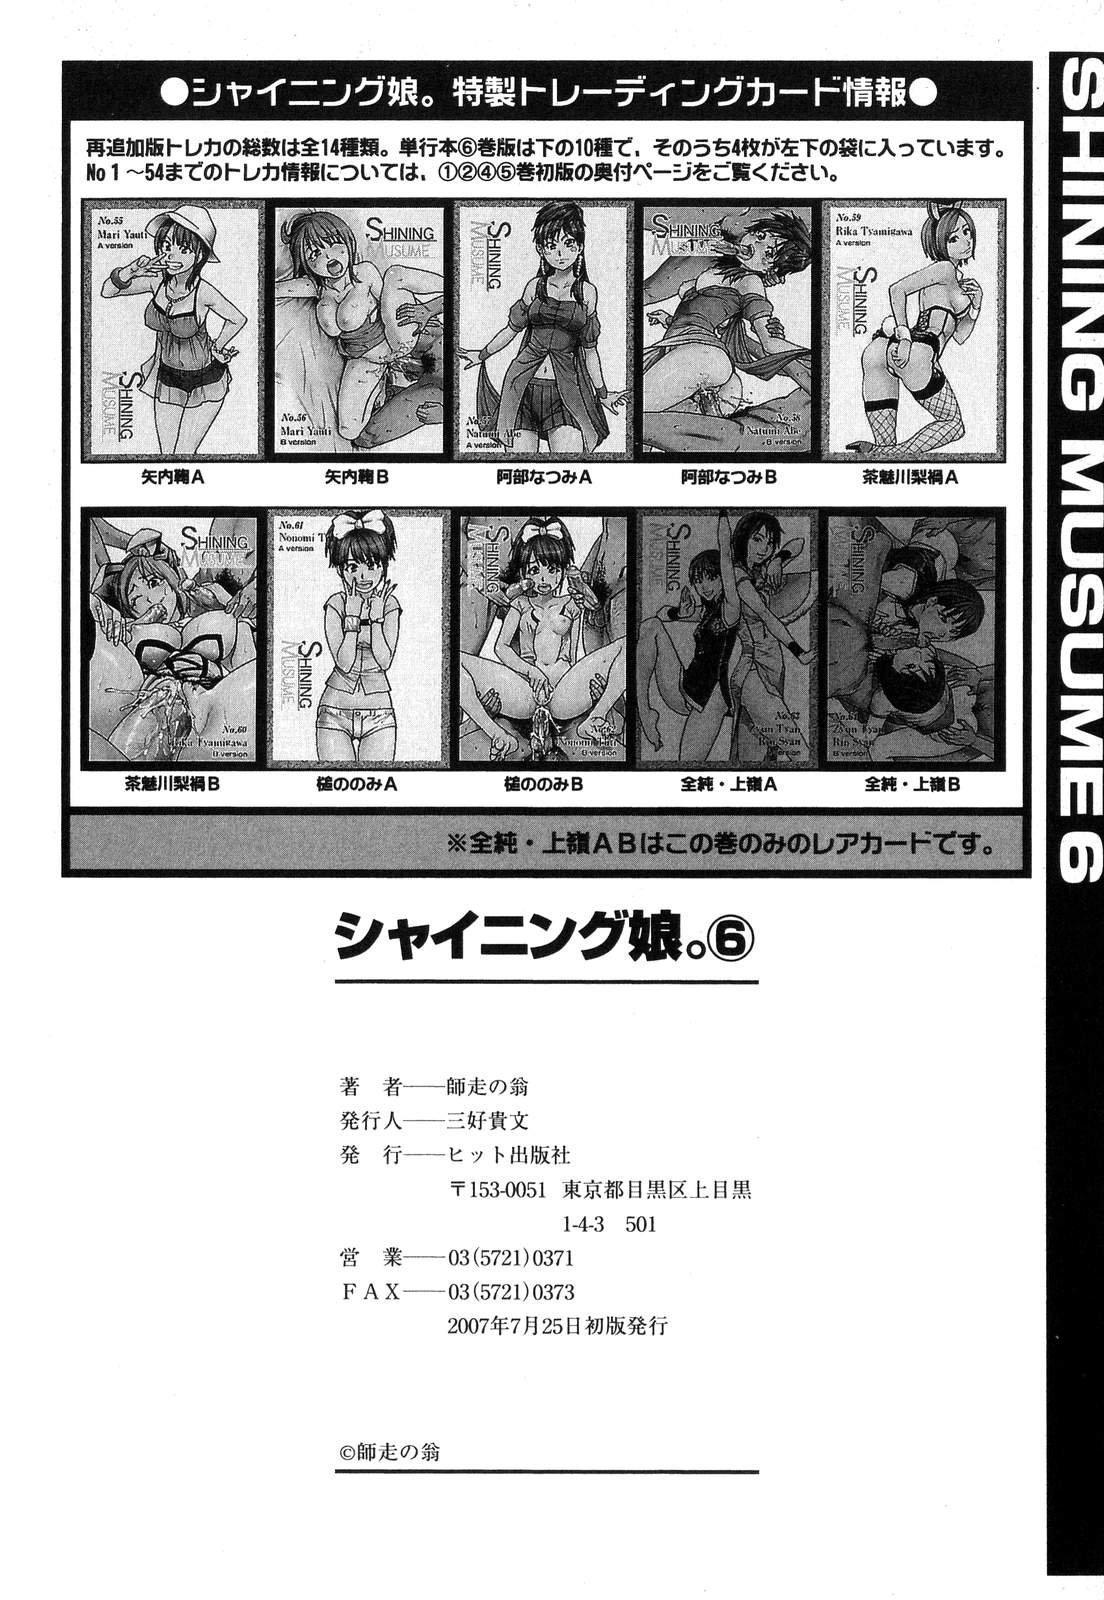 Shining Musume. 6. Rainbow Six 220